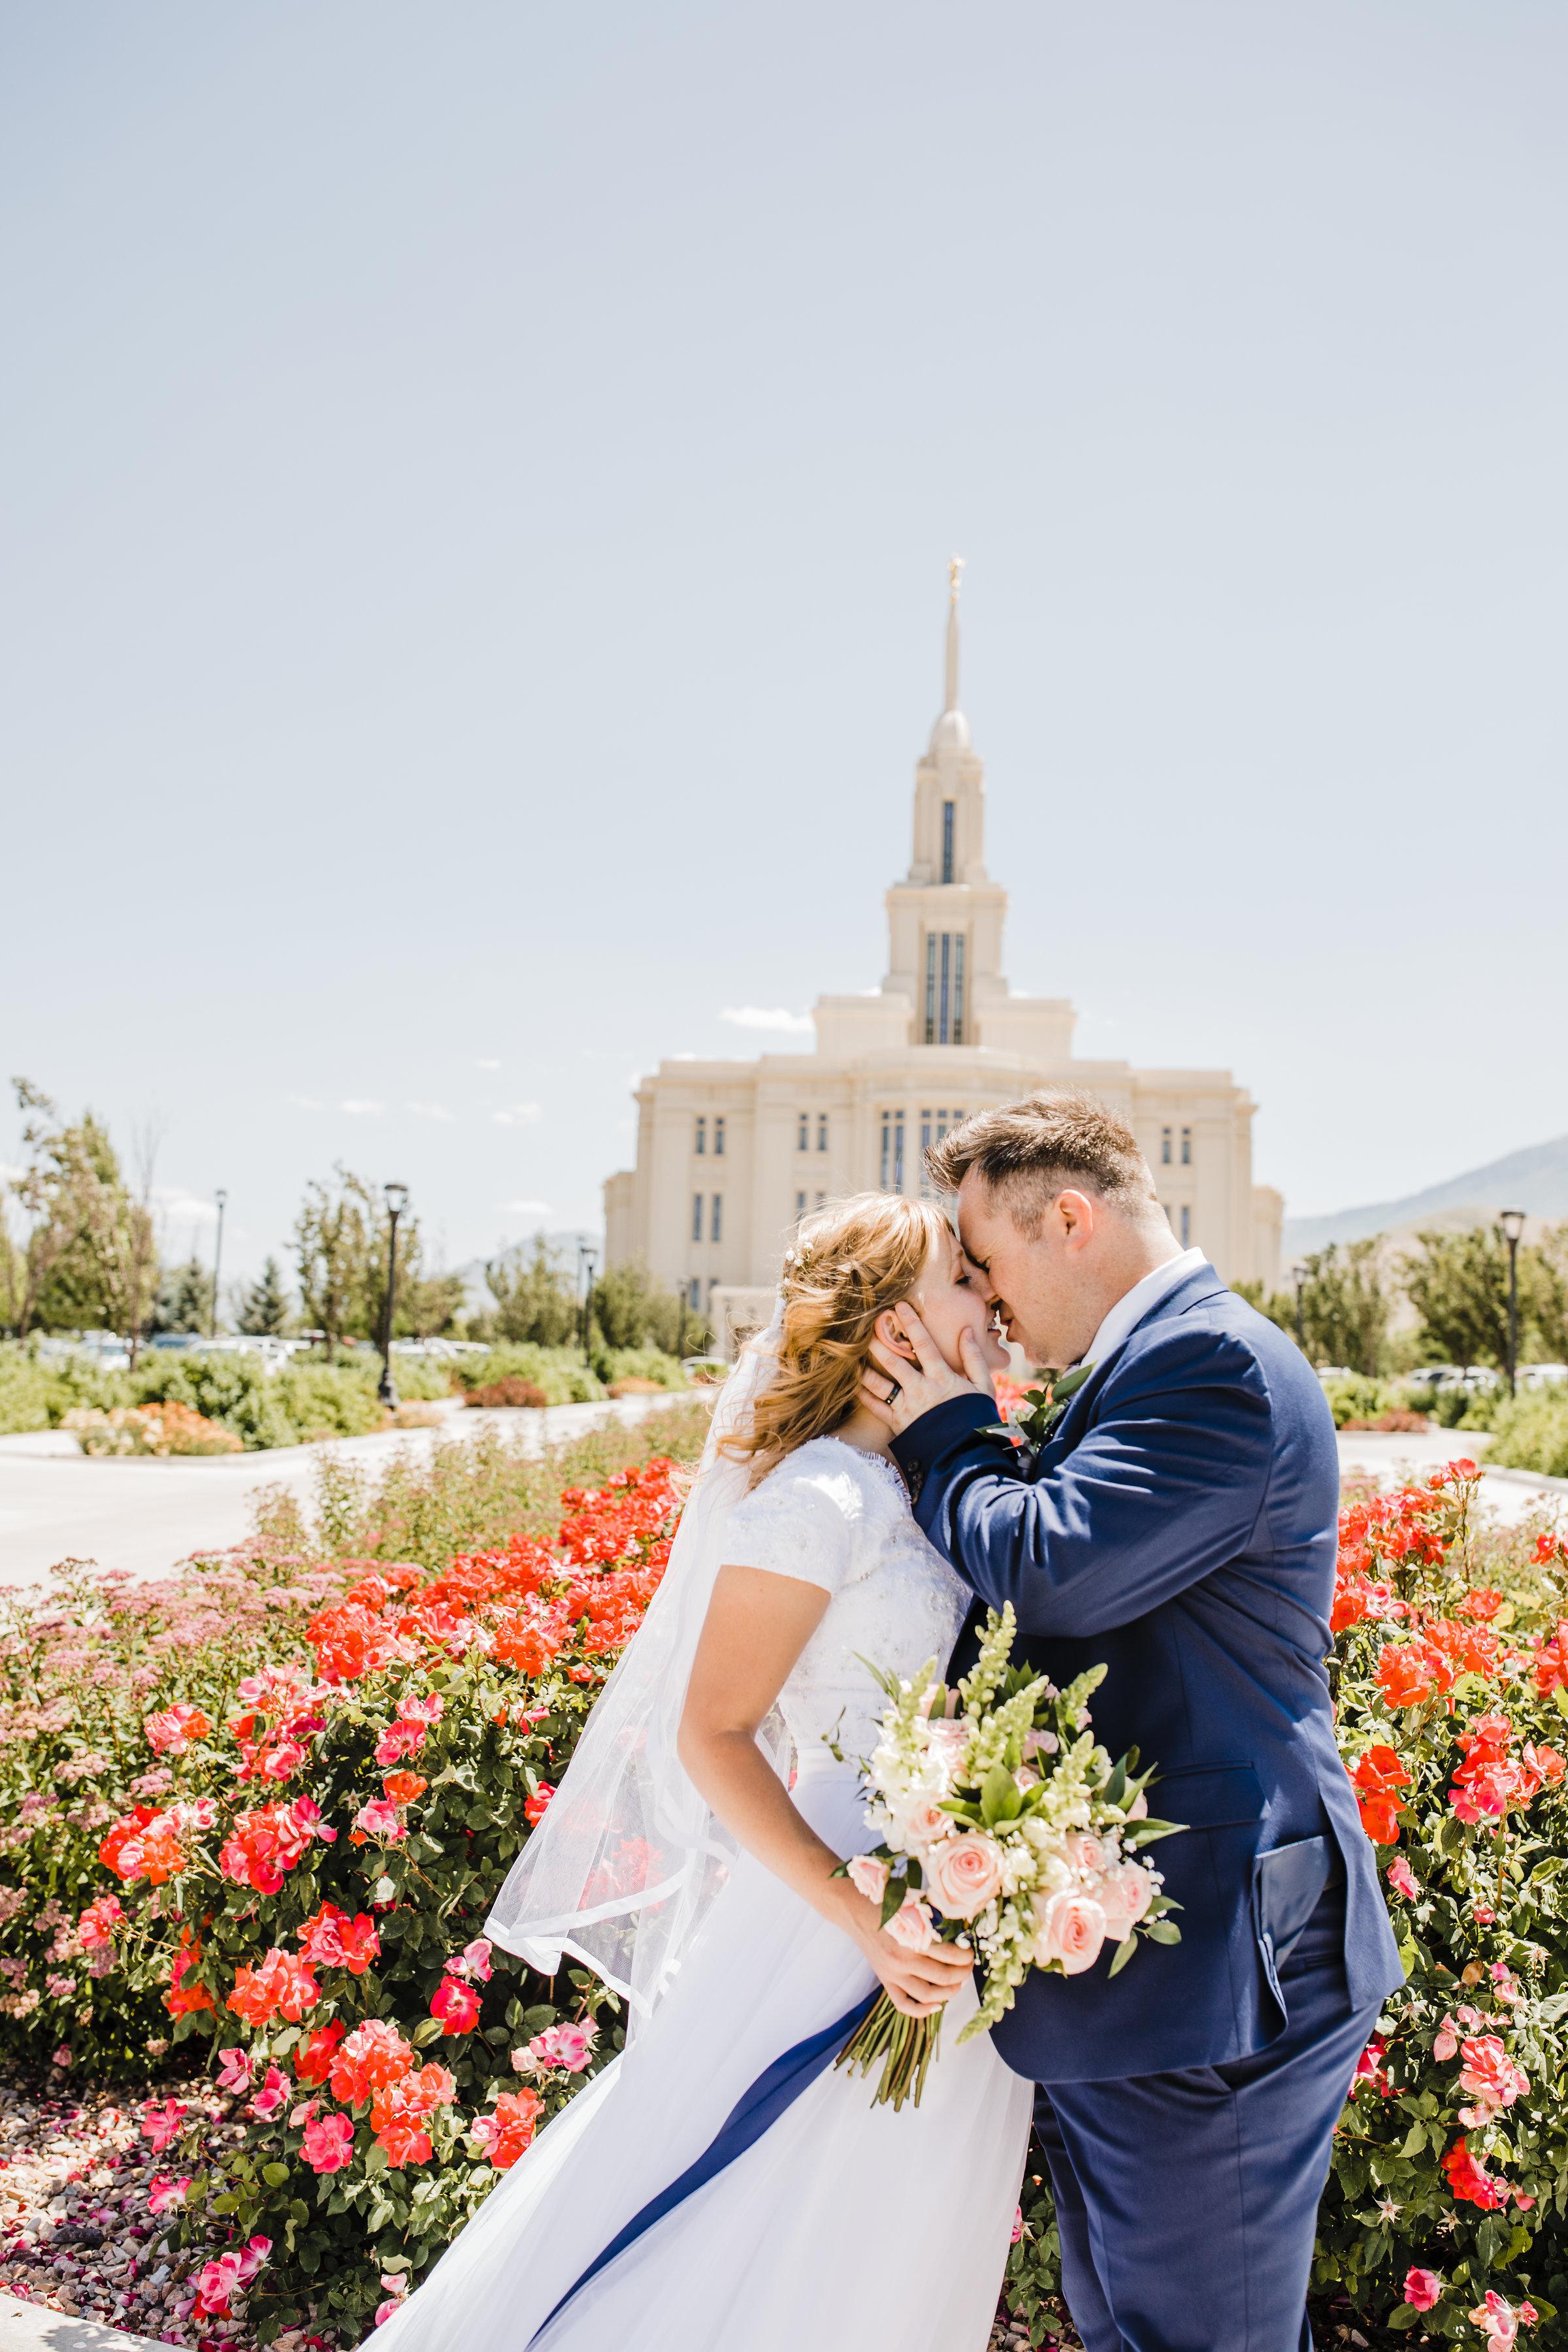 professional wedding photographer in logan utah lds temple wedding kissing red flowers